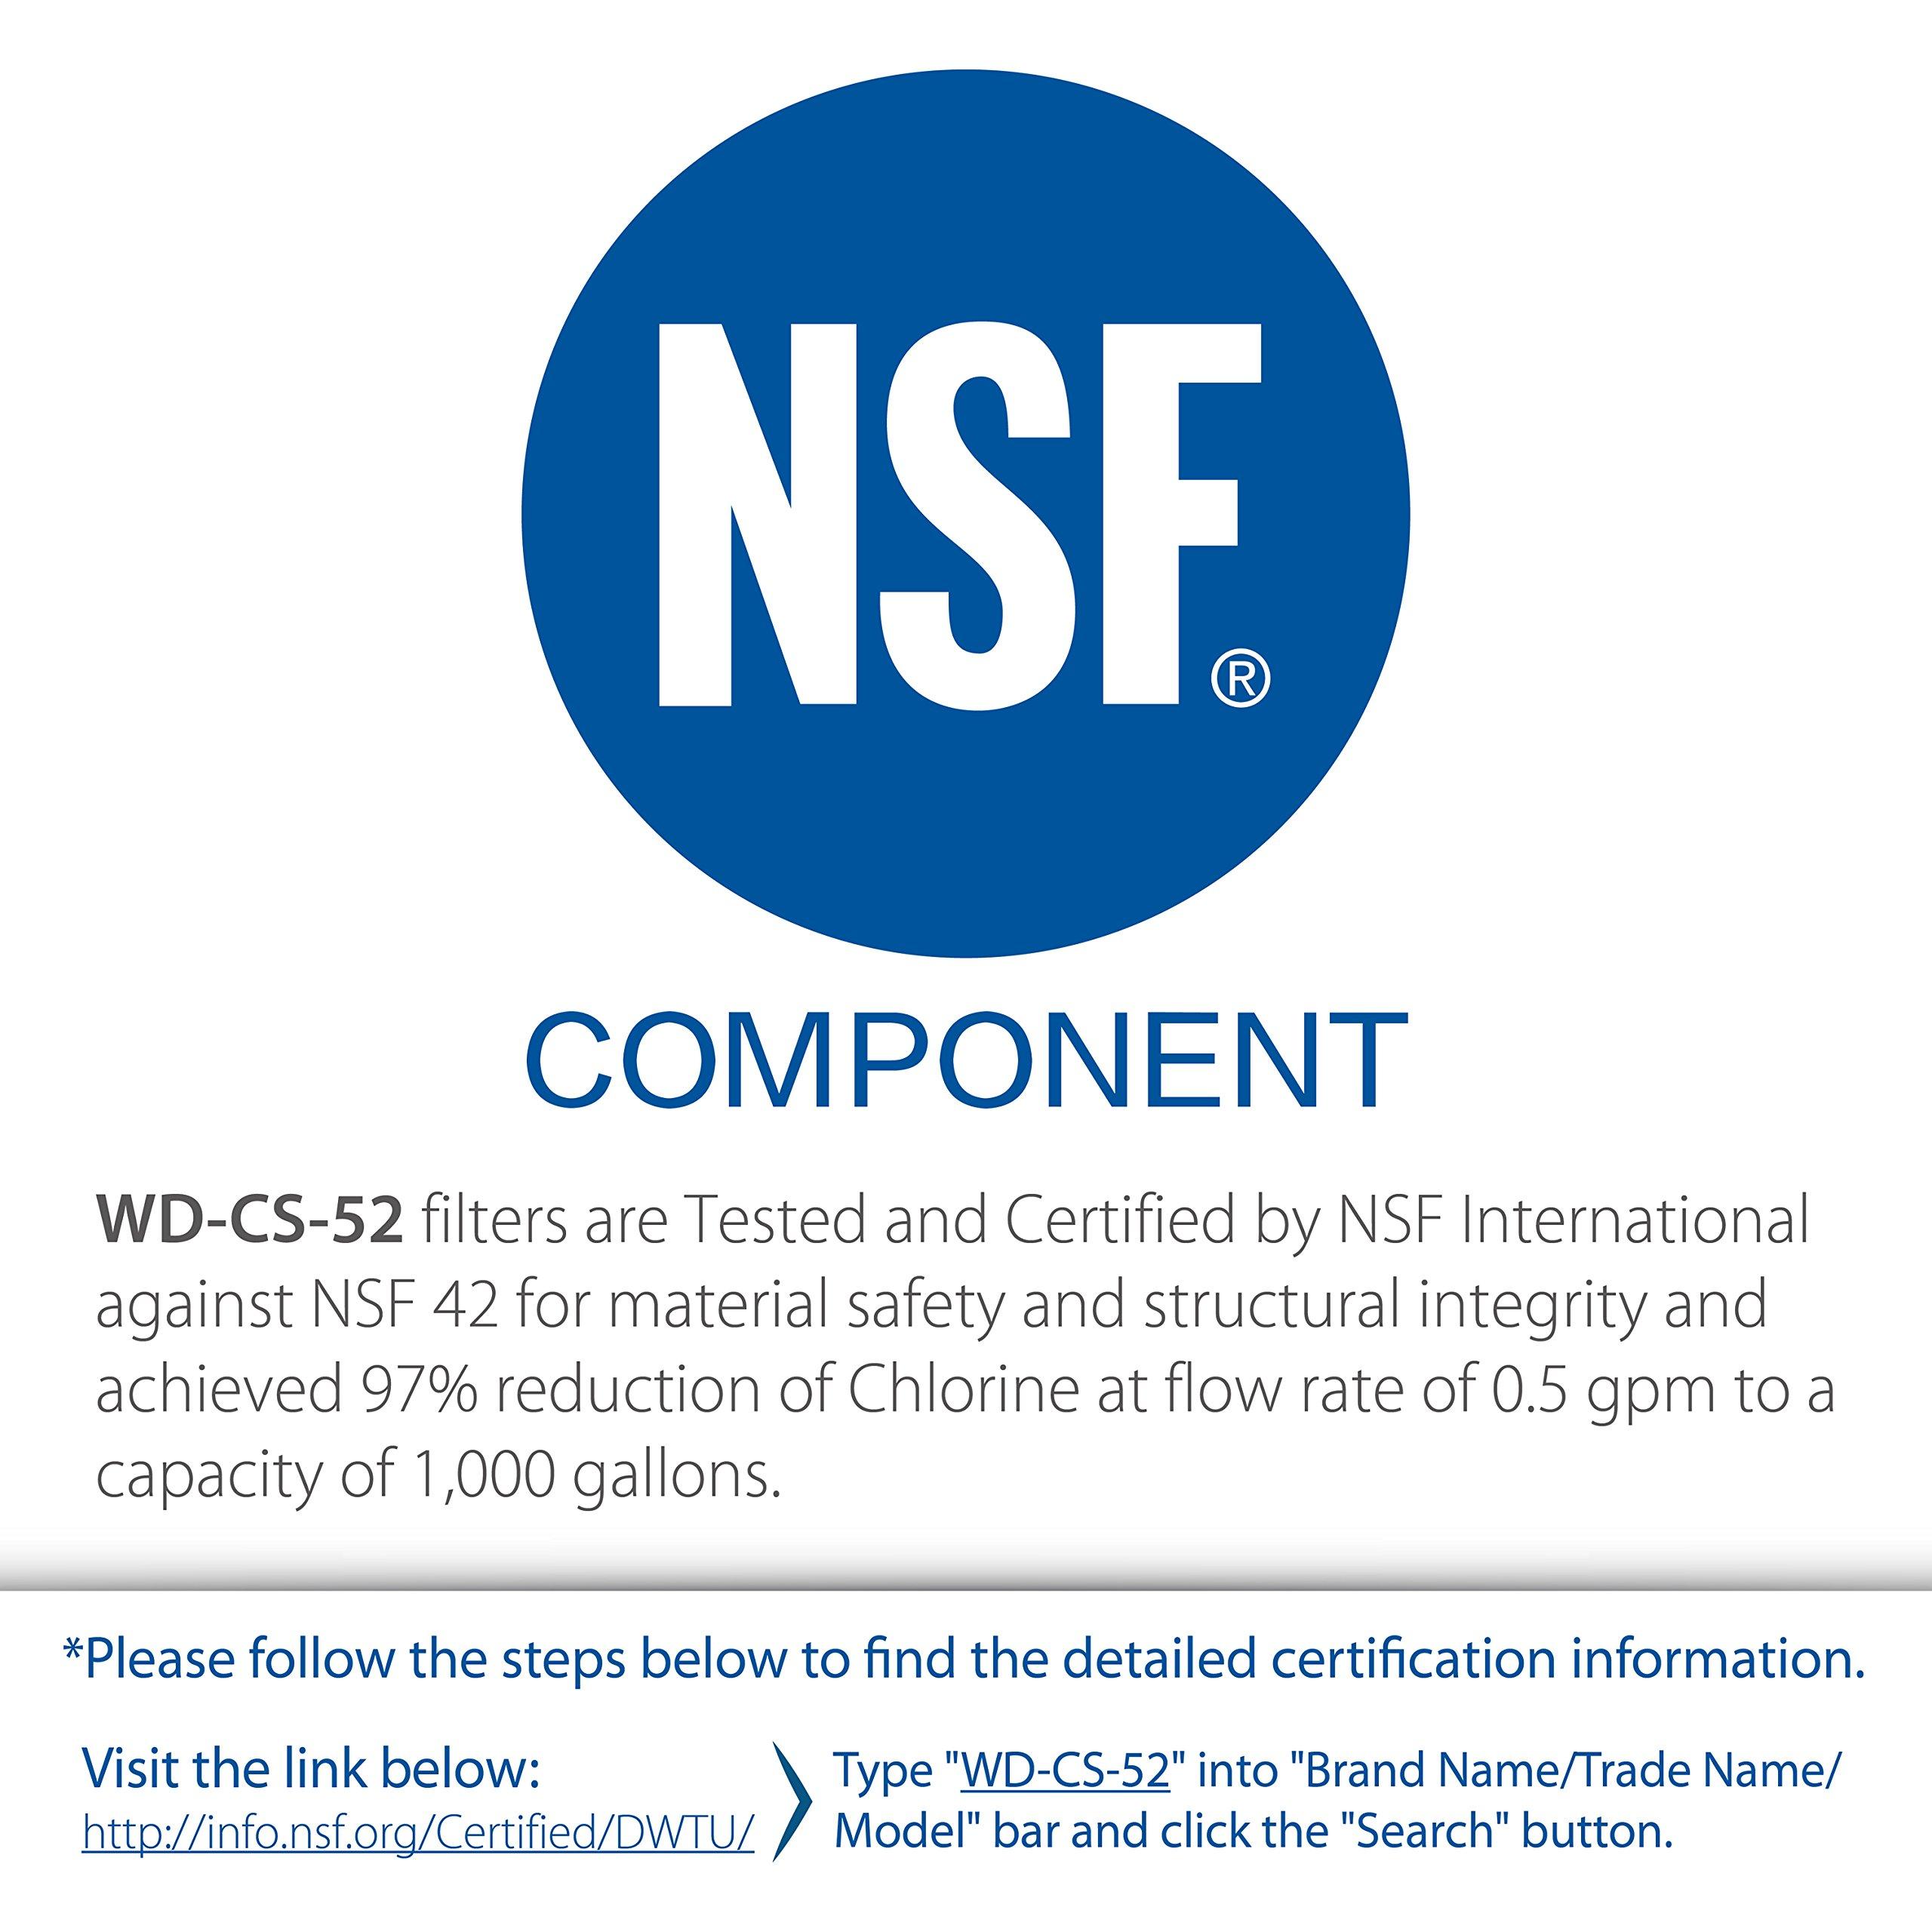 CS-562 Pack of 3 WD-CS-52 CS-522 Waterdrop Refrigerator Water Filter Compatible with 3M Cuno CS-52 2168701 CS-51 51000 CS-512 CS-532 CS450 W1085590 56932 CS-452 52000